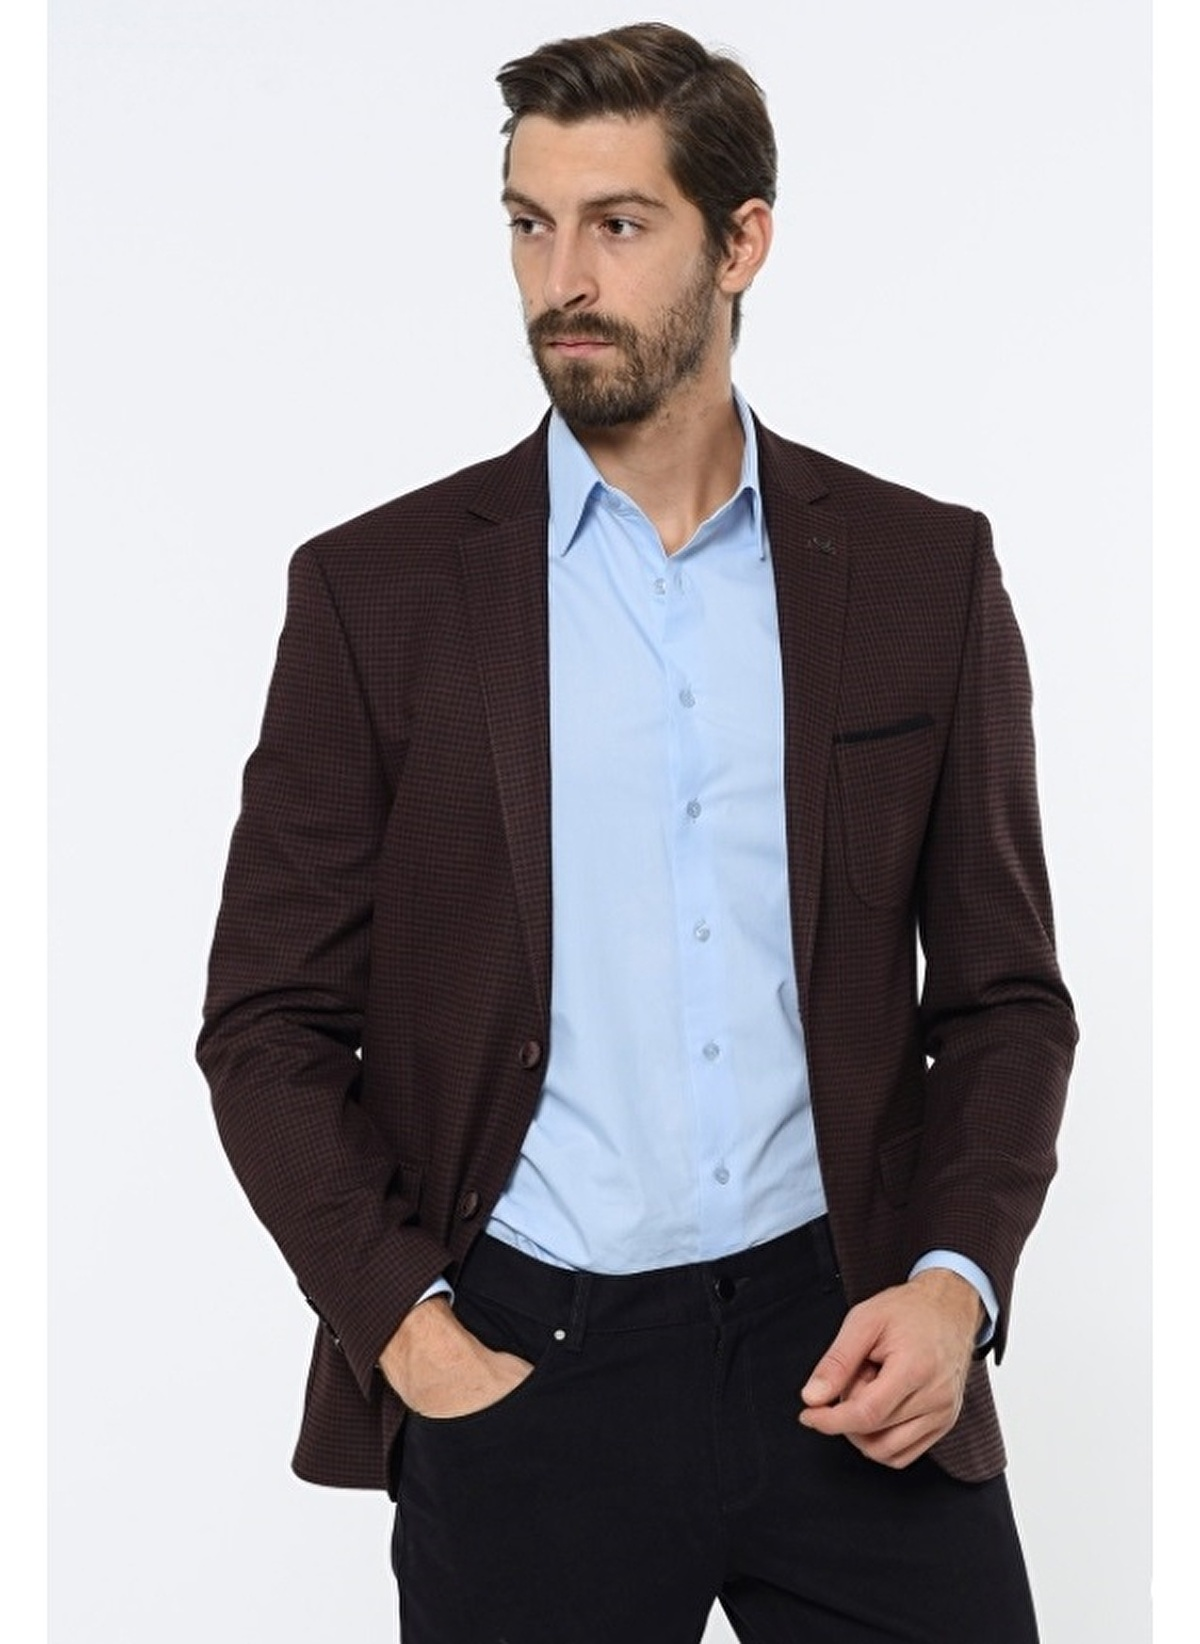 Comienzo Slim Fit Blazer Ceket 21070 Ceket – 289.0 TL